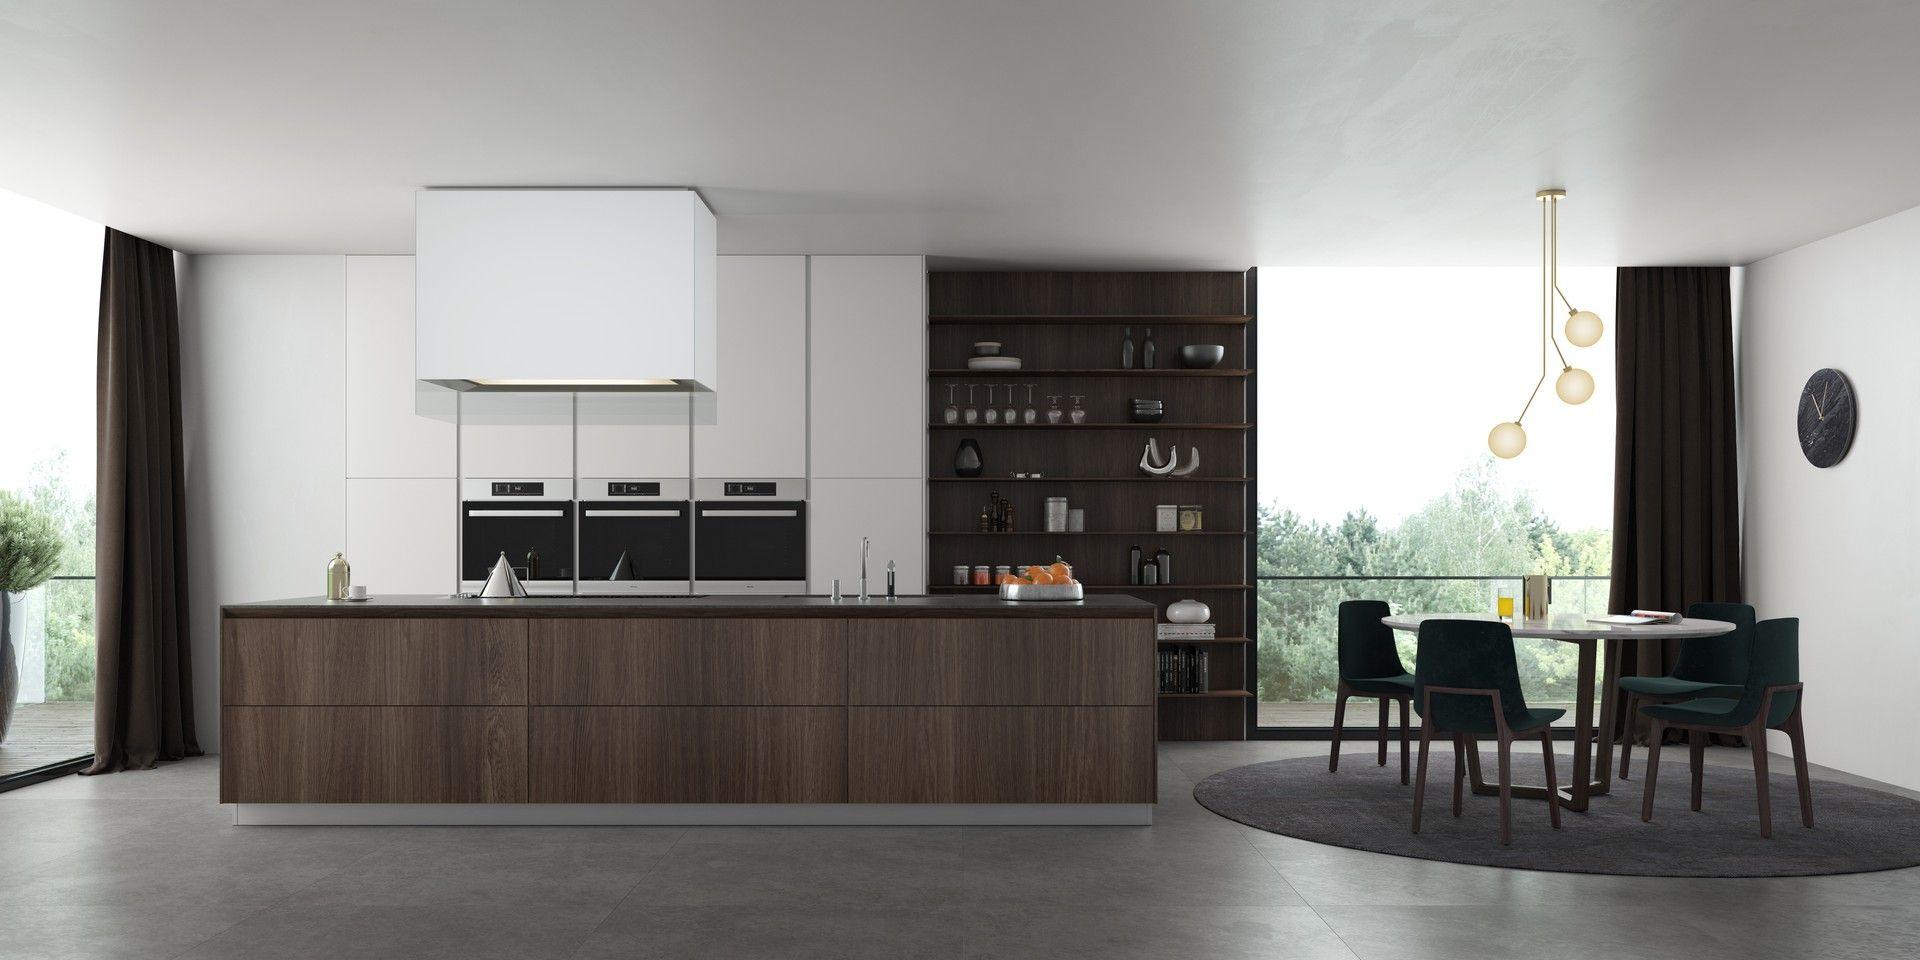 Simplicity Kitchen Designs Simplicity Kitchen Designs With